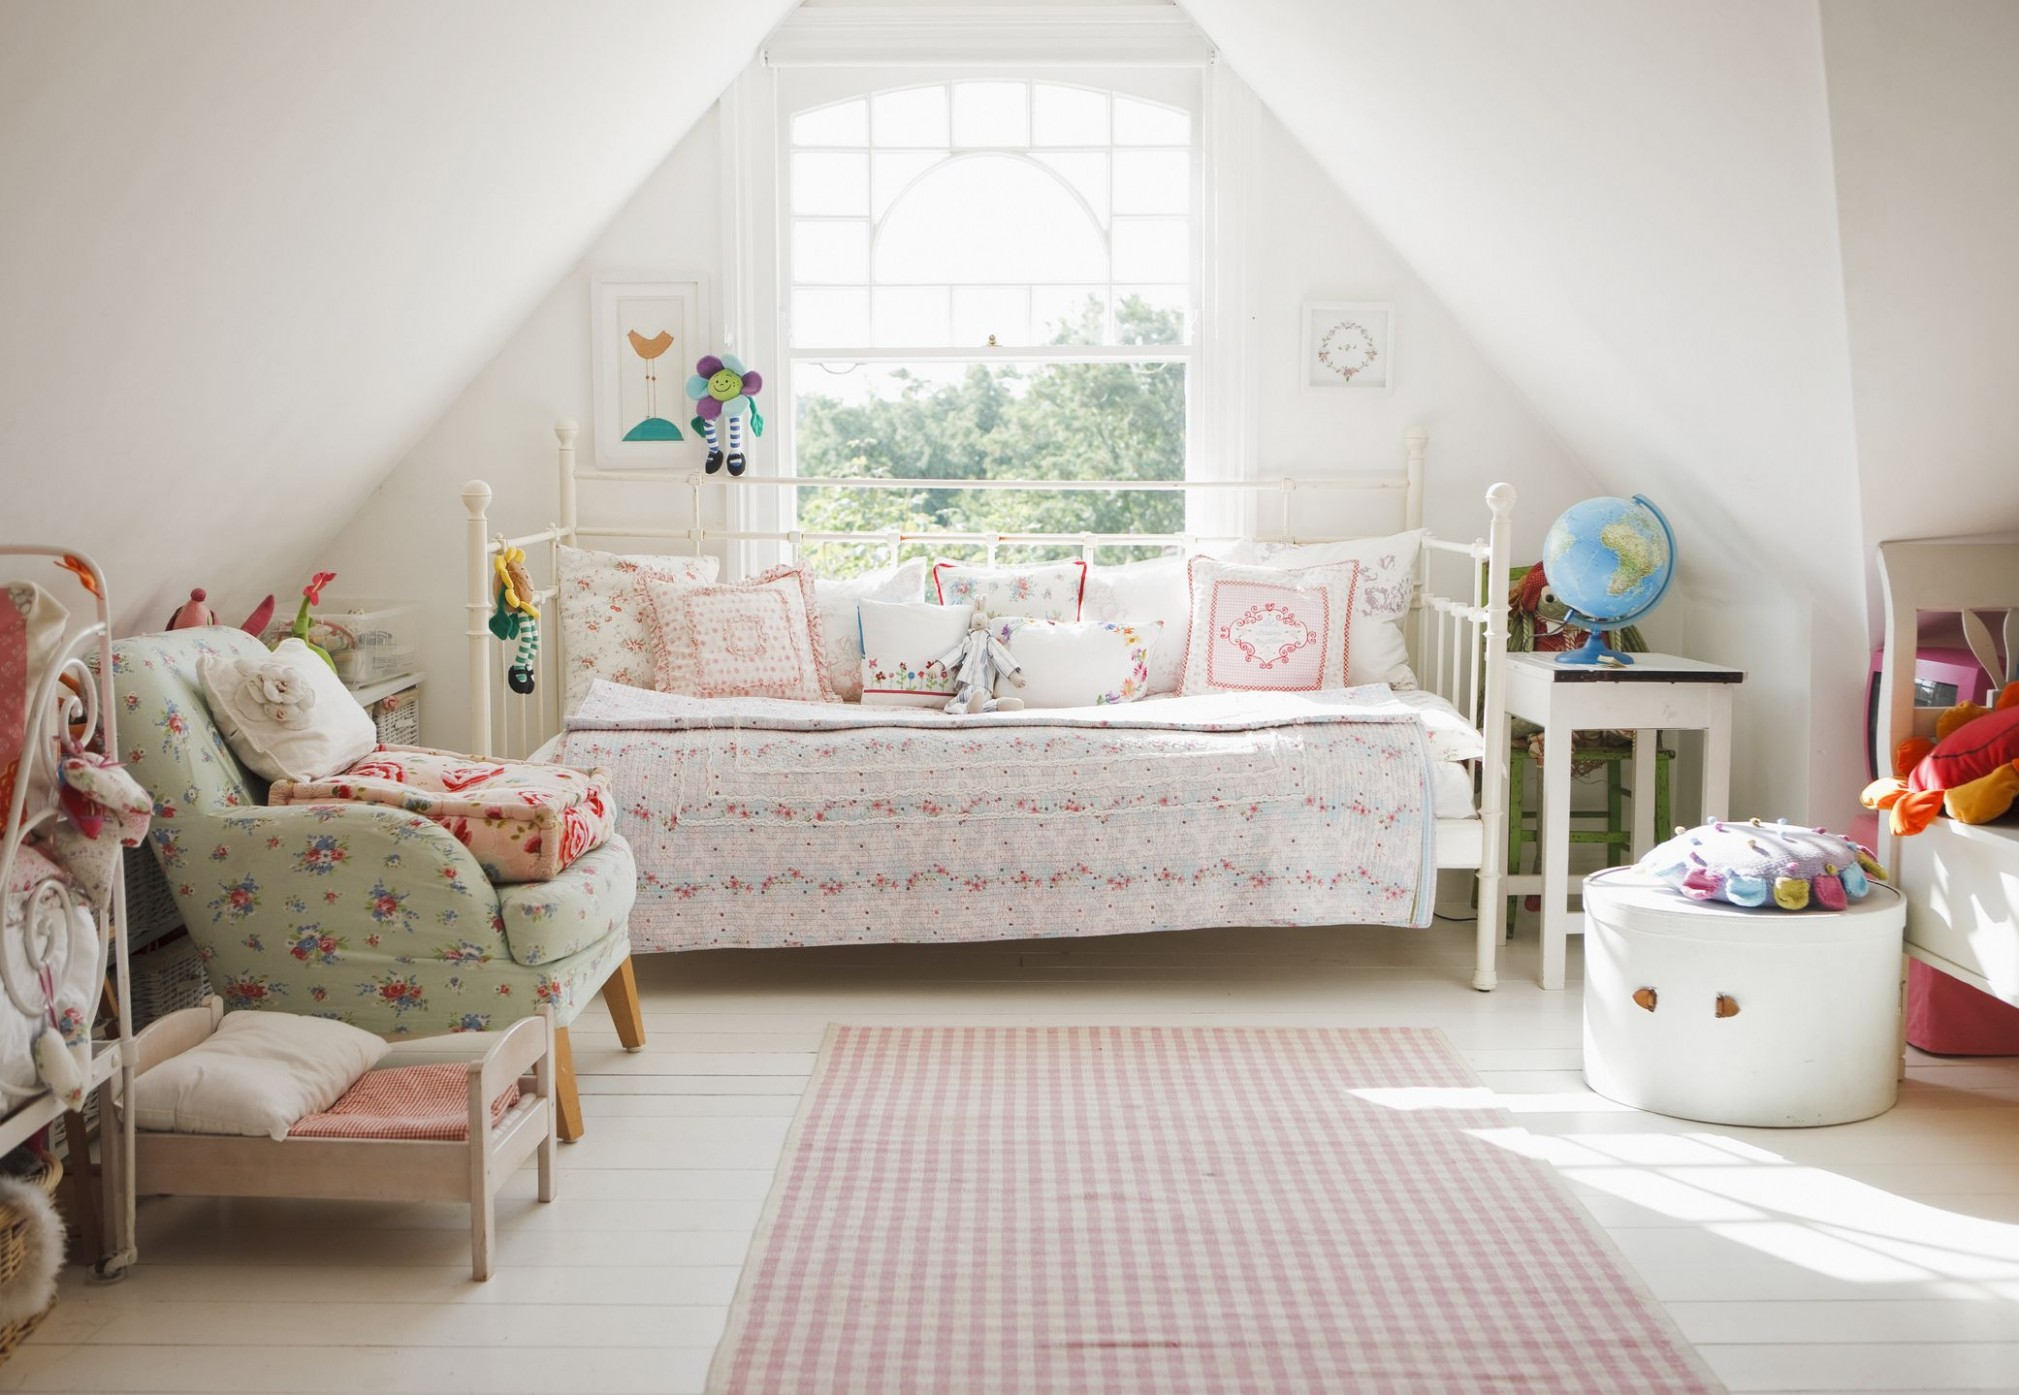 11 Best Baby Room Ideas - Nursery Design, Organization, and  - Baby Room Interior